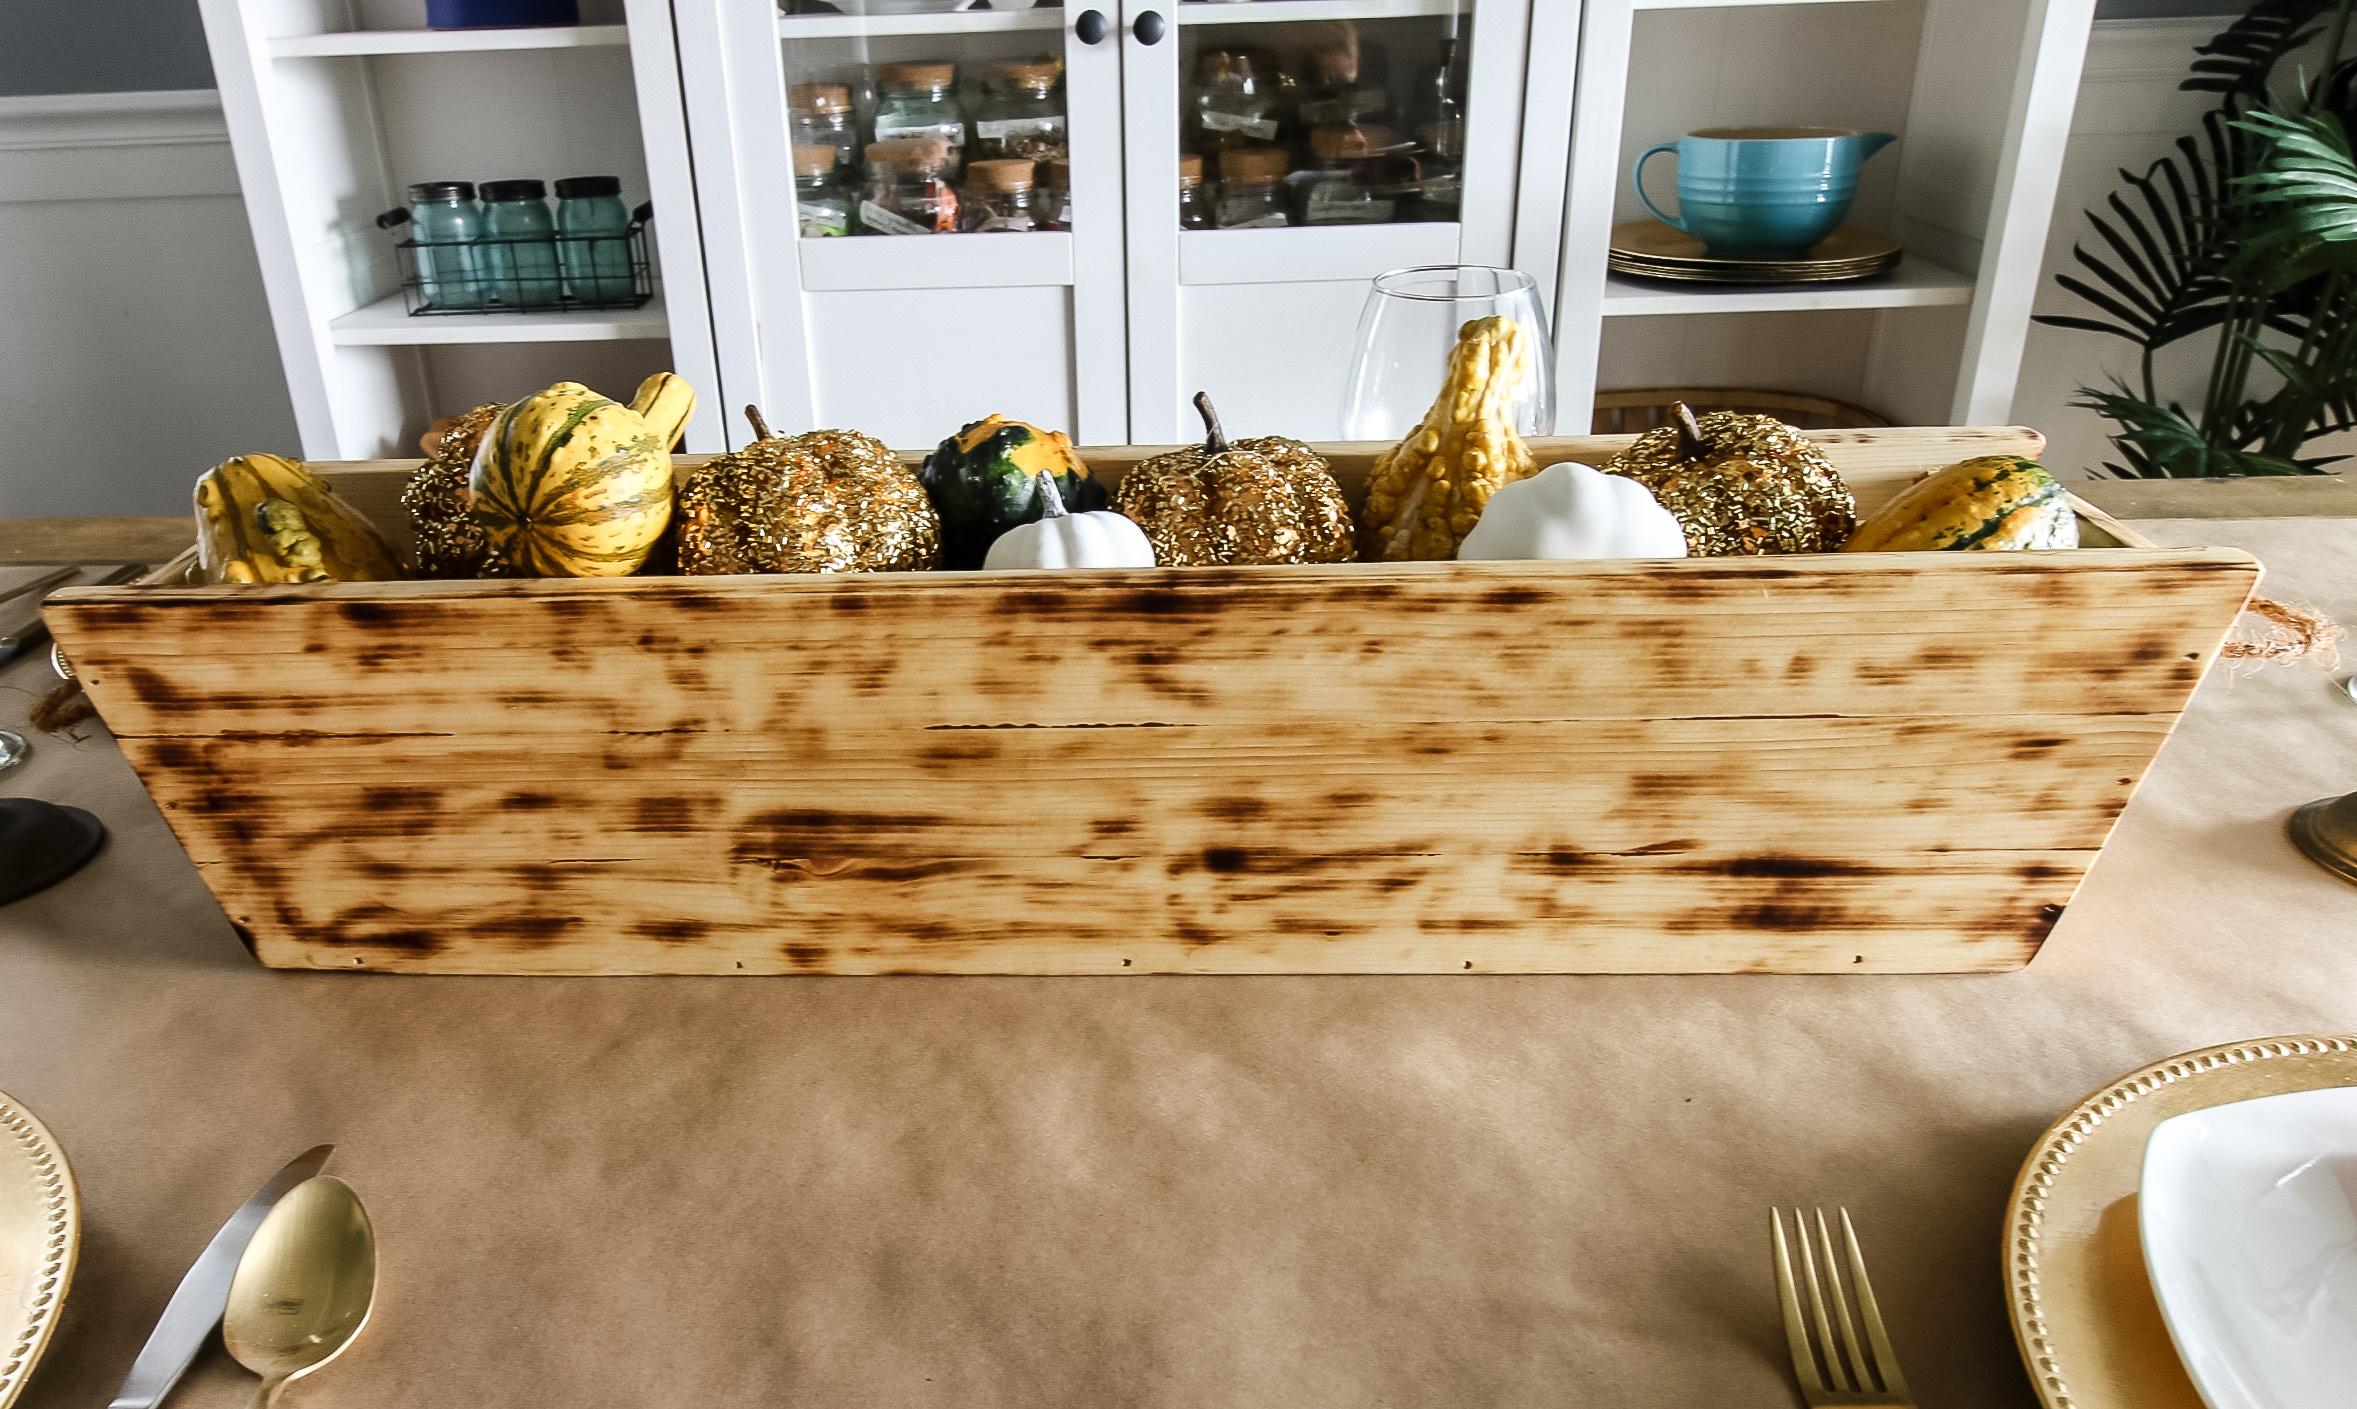 Full shot of DIY wooden trough